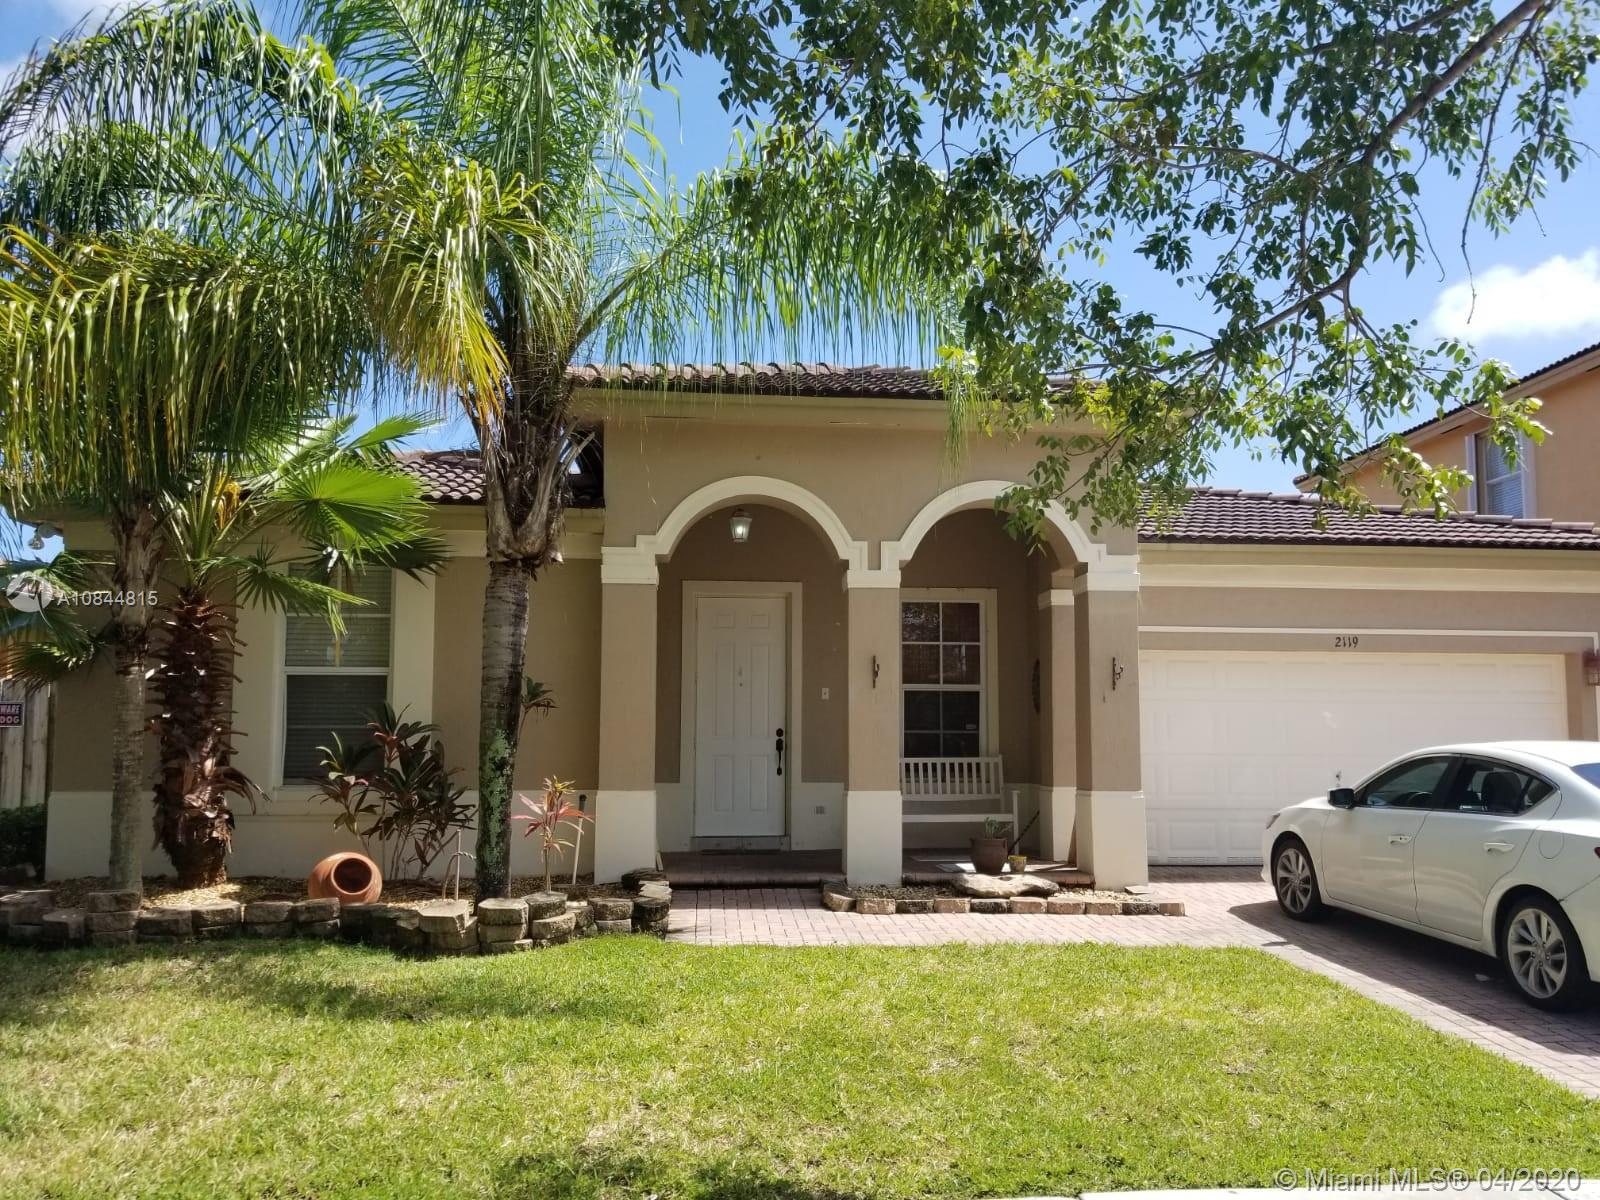 2119 NE 40th Ave #0, Homestead, FL 33033 - Homestead, FL real estate listing